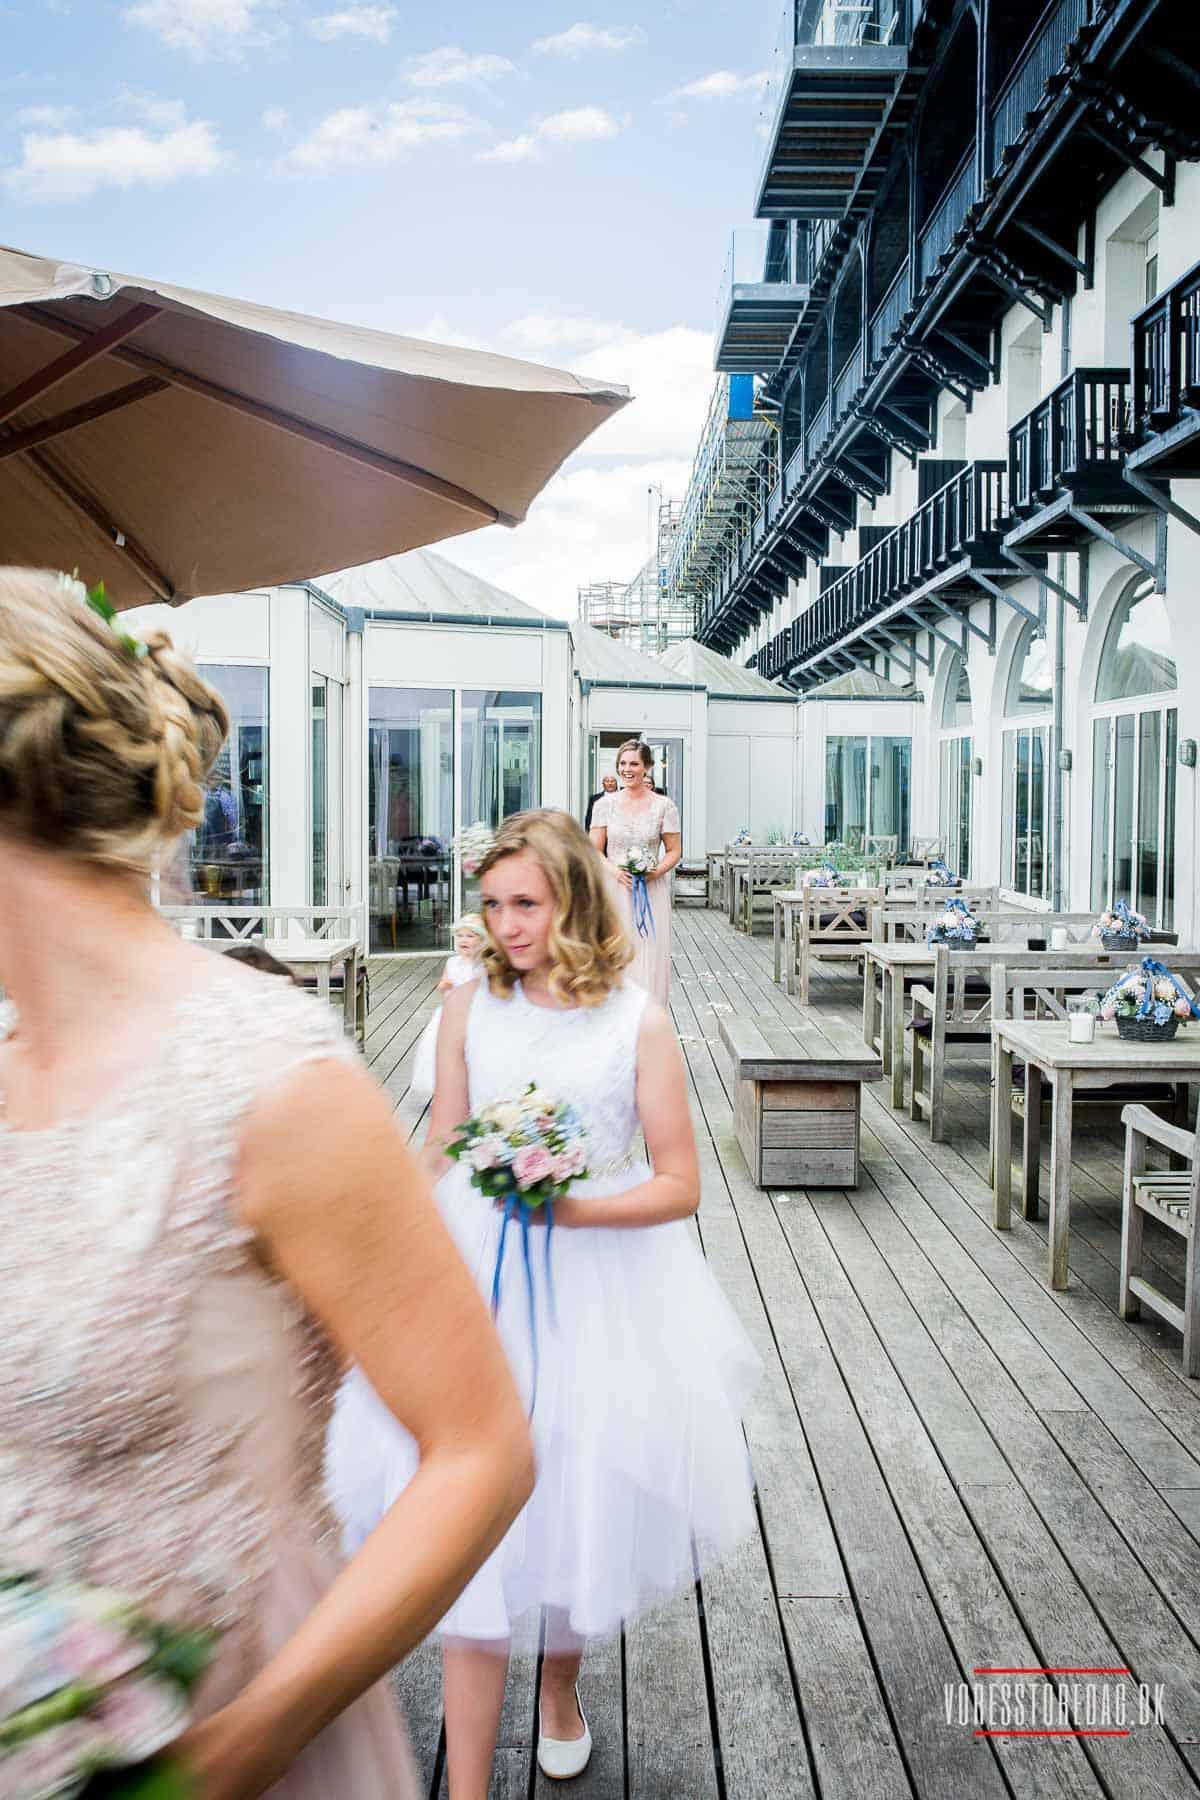 Danske ateister holder højtidelige bryllupper